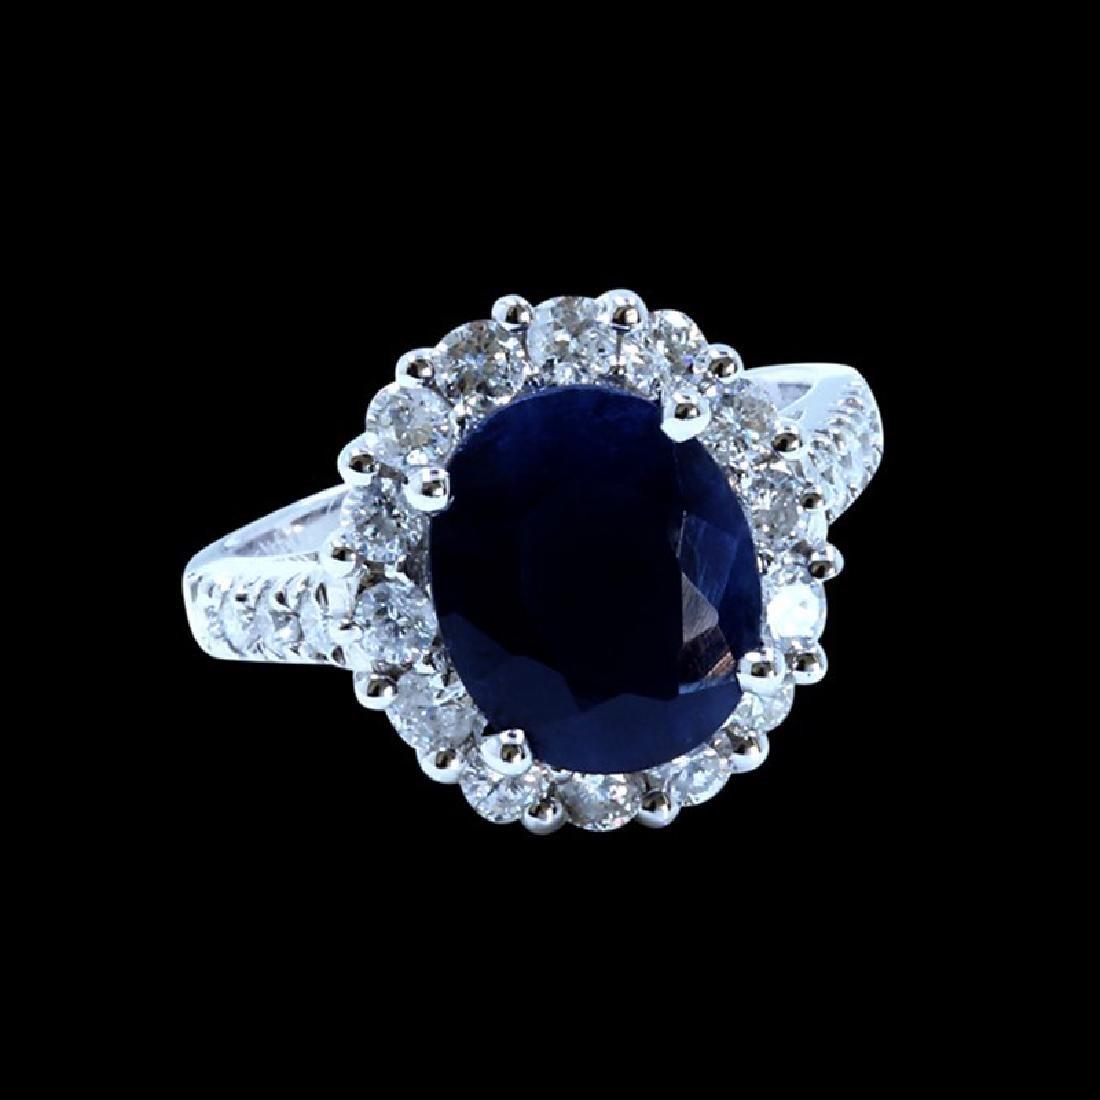 4.57CT NATURAL CEYLON BLUE SAPPHIRE 14K WHITE GOLD RING